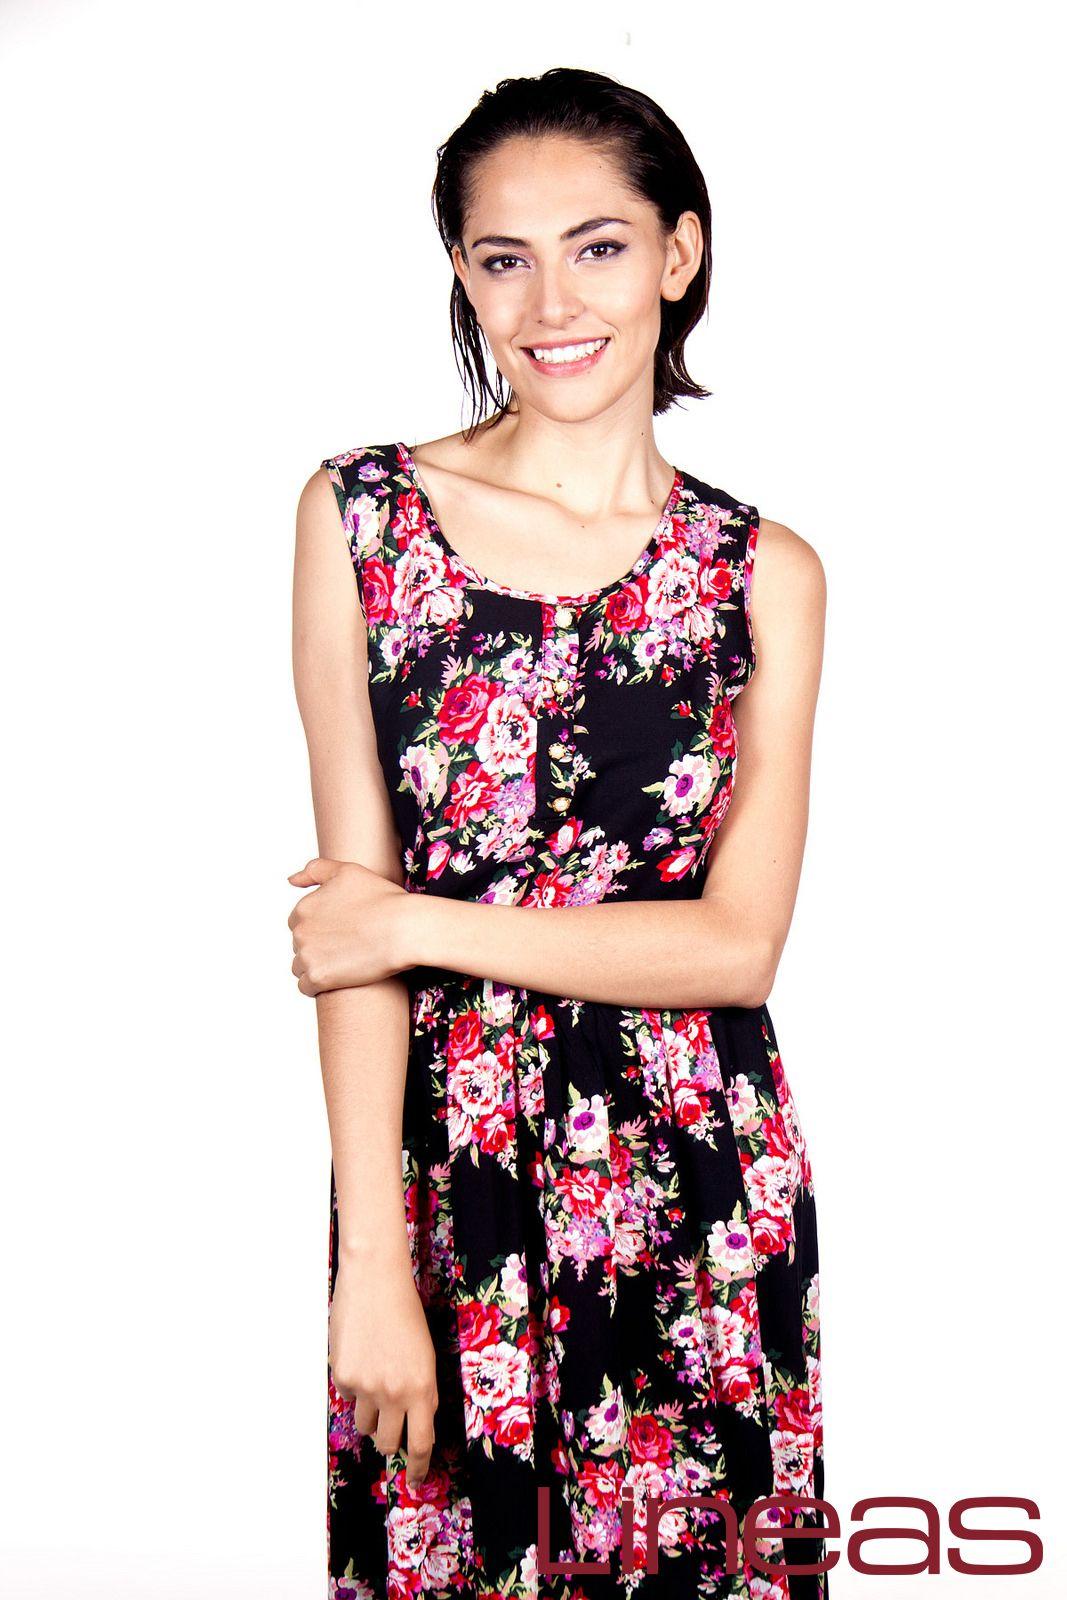 Vestido, Modelo 17521. Precio $200 MXN #Lineas #outfit #moda #tendencias #2014 #ropa #prendas #estilo #primavera #outfit #vestido